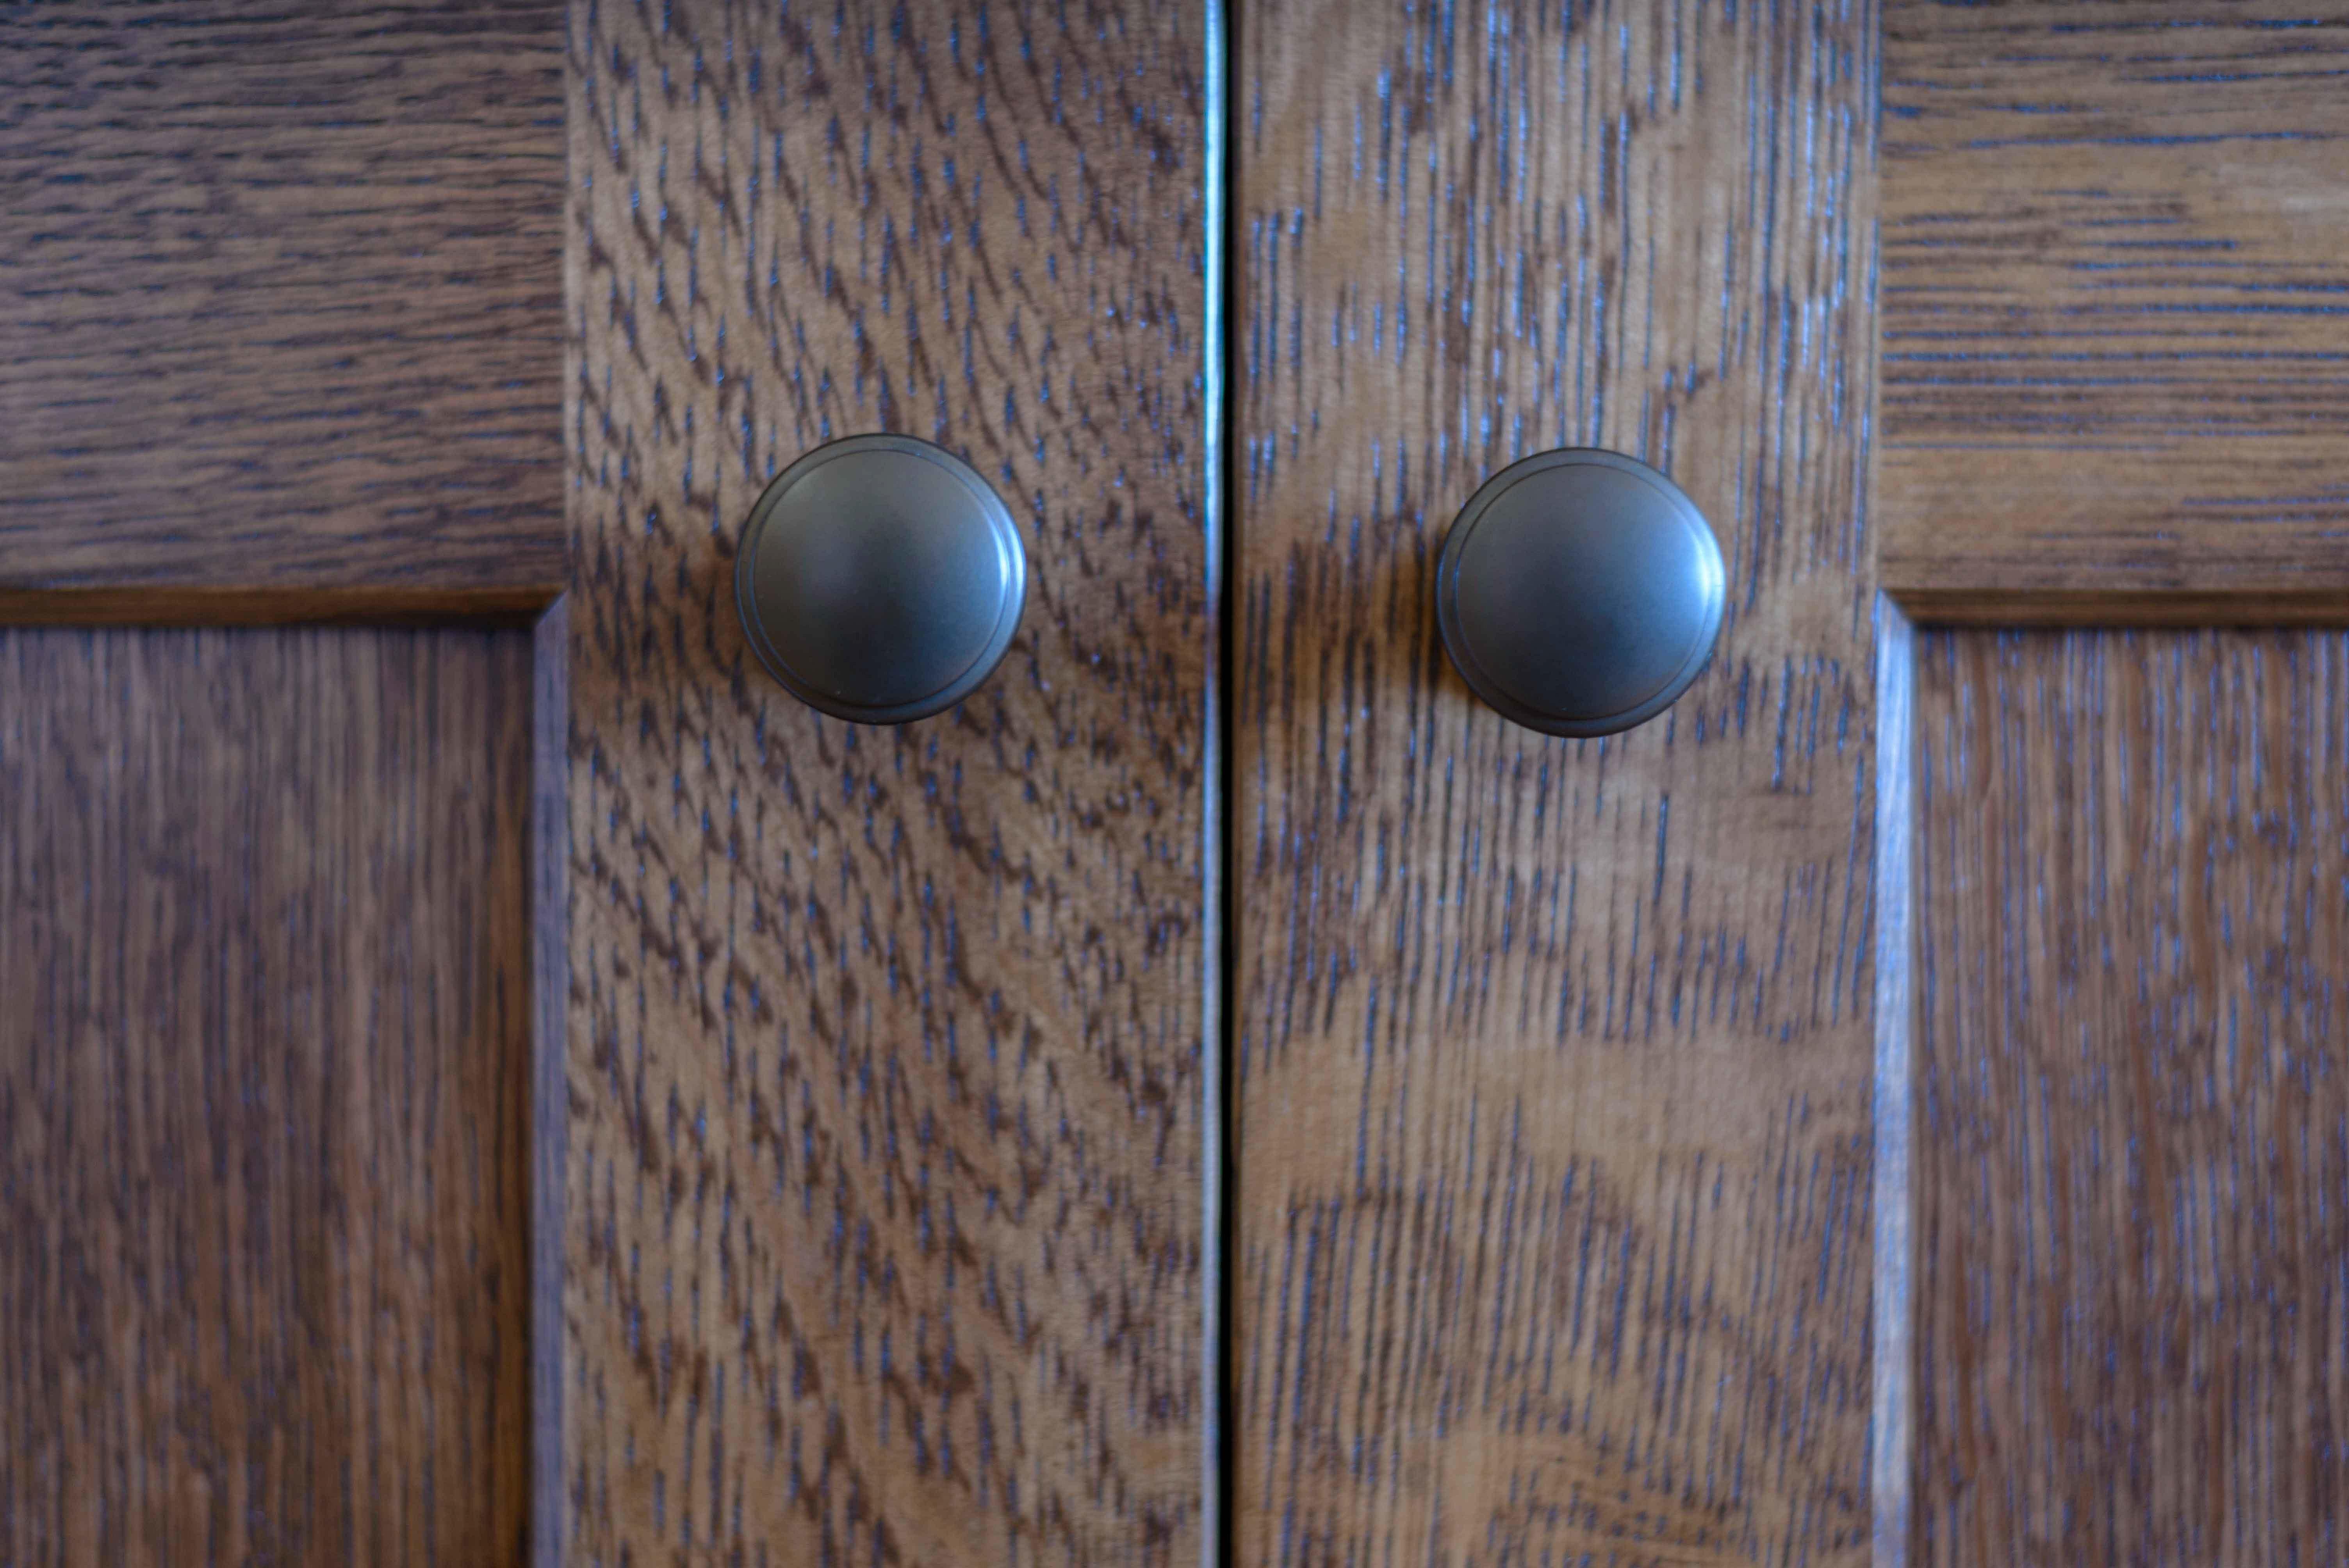 Custom Cabinet Pulls The Wood Shop Millwork Joinery Inc Custom Cabinet Pulls